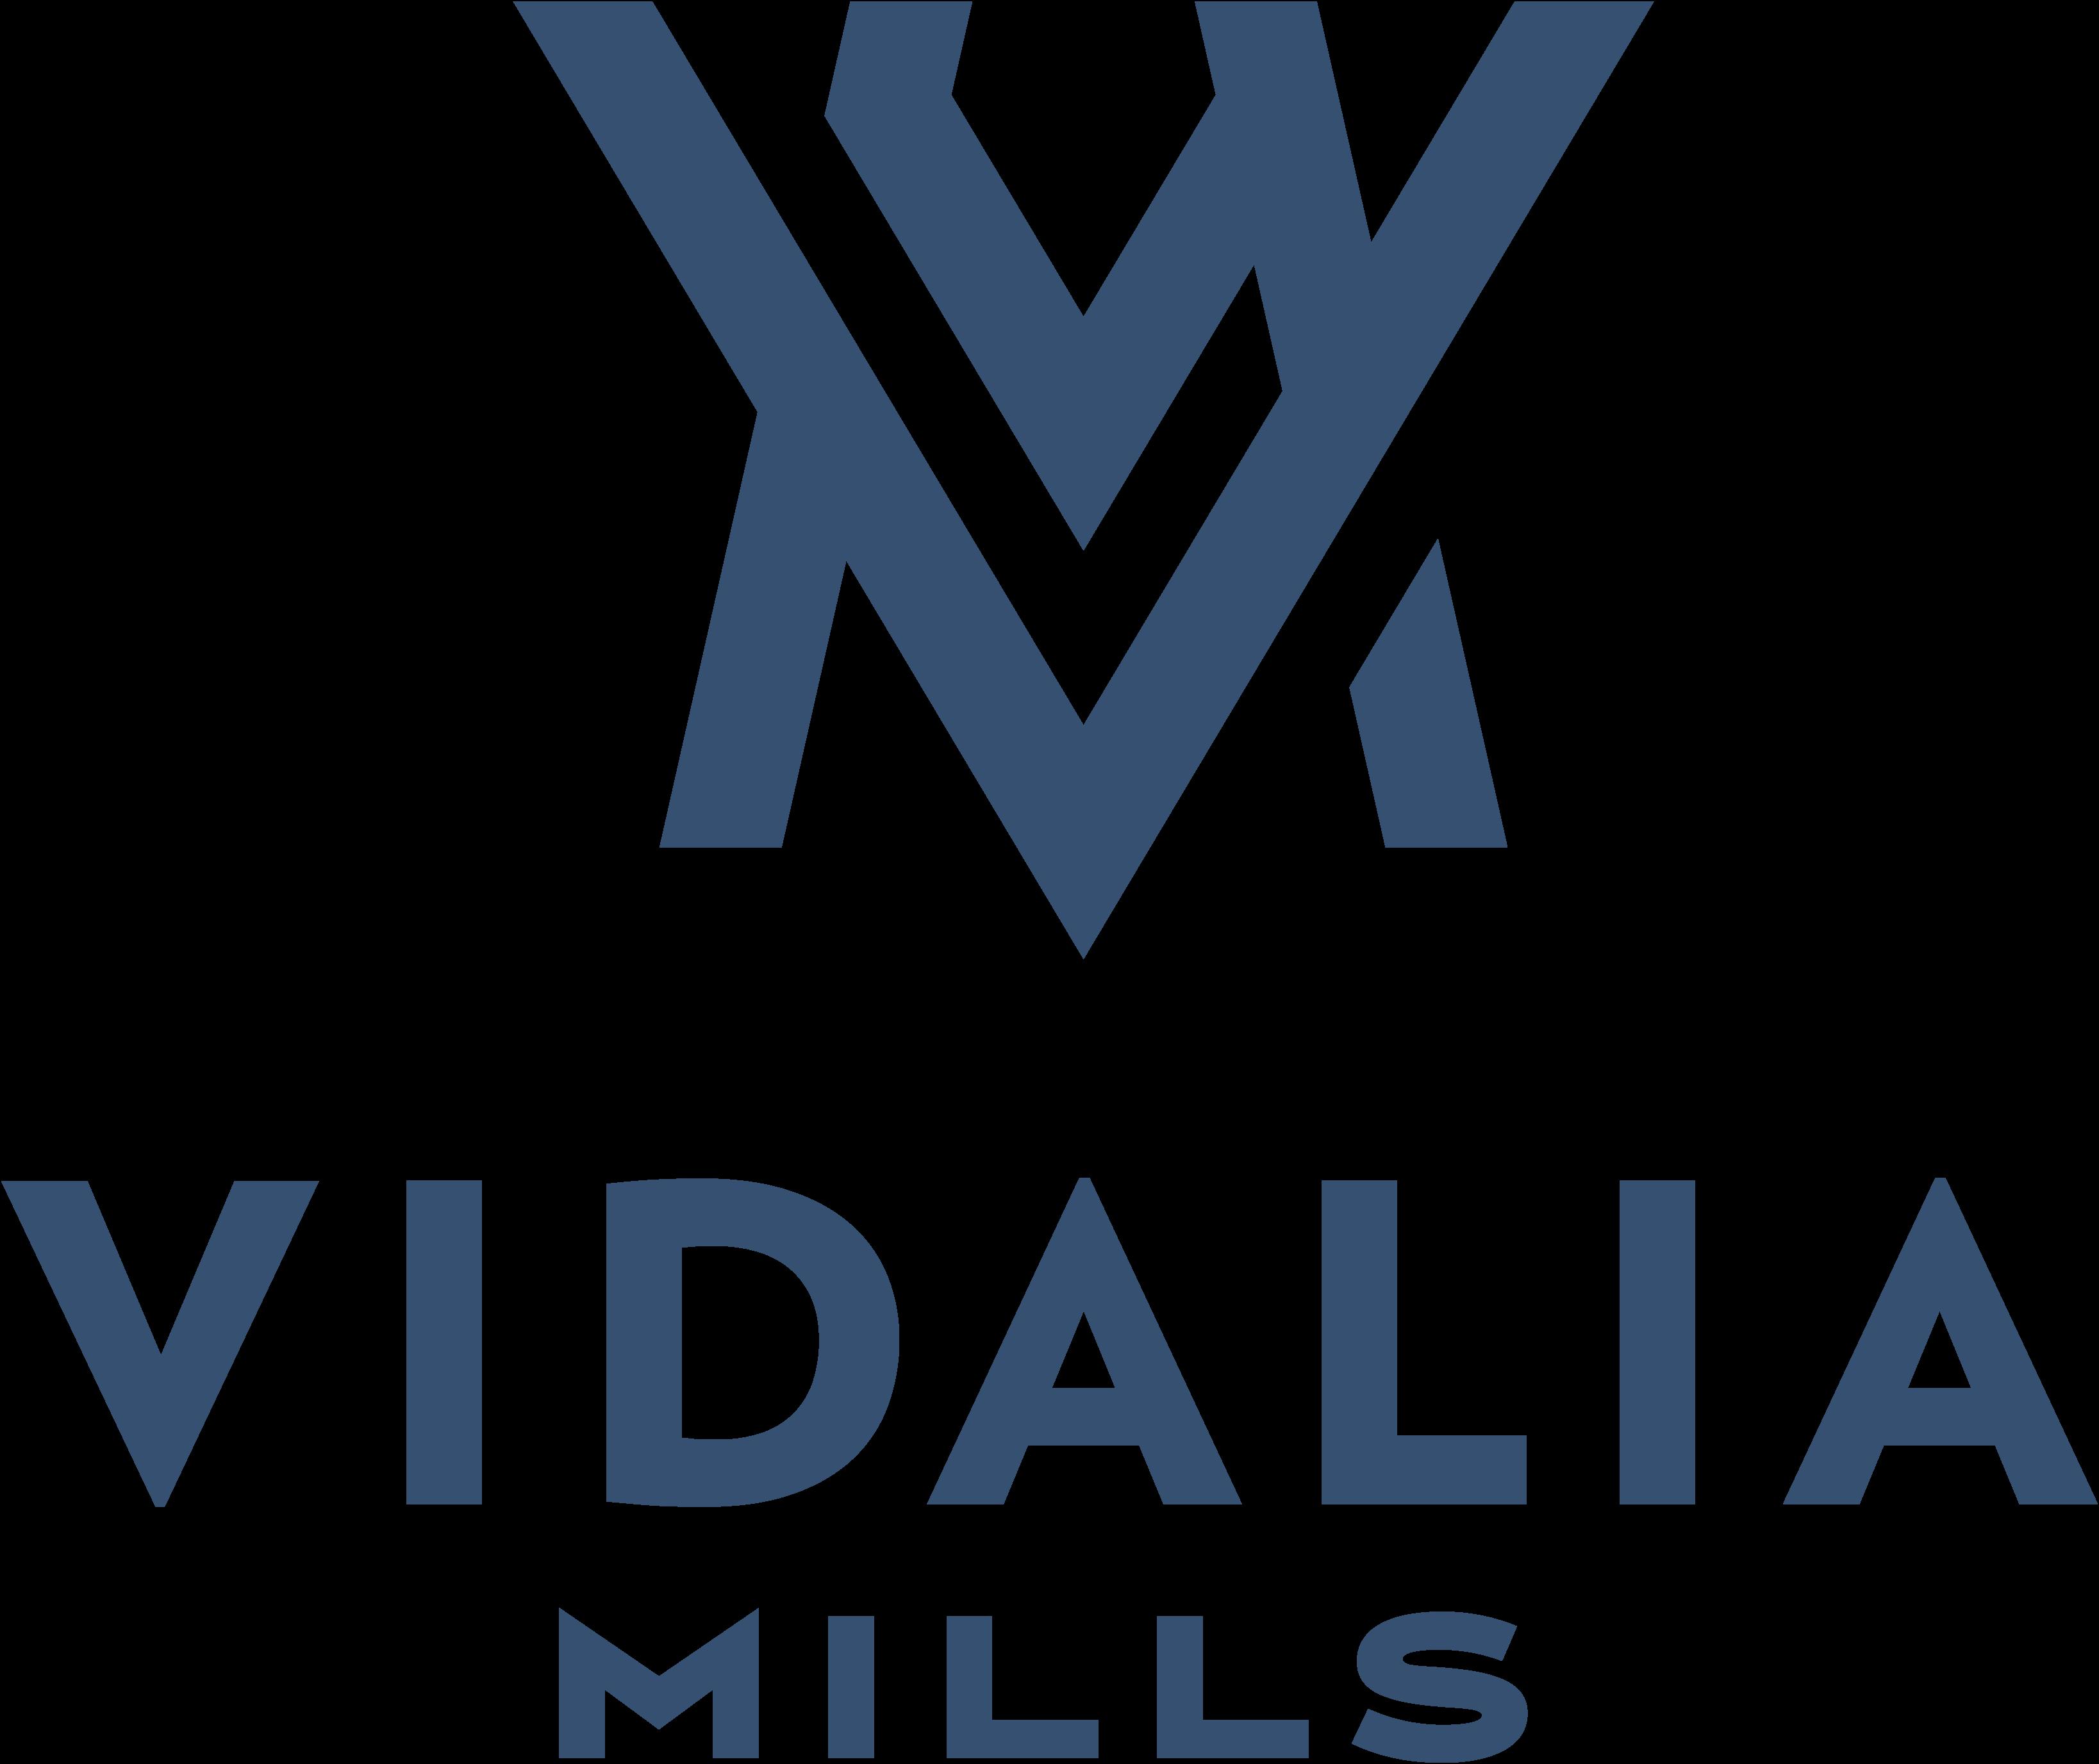 Vidalia Mills